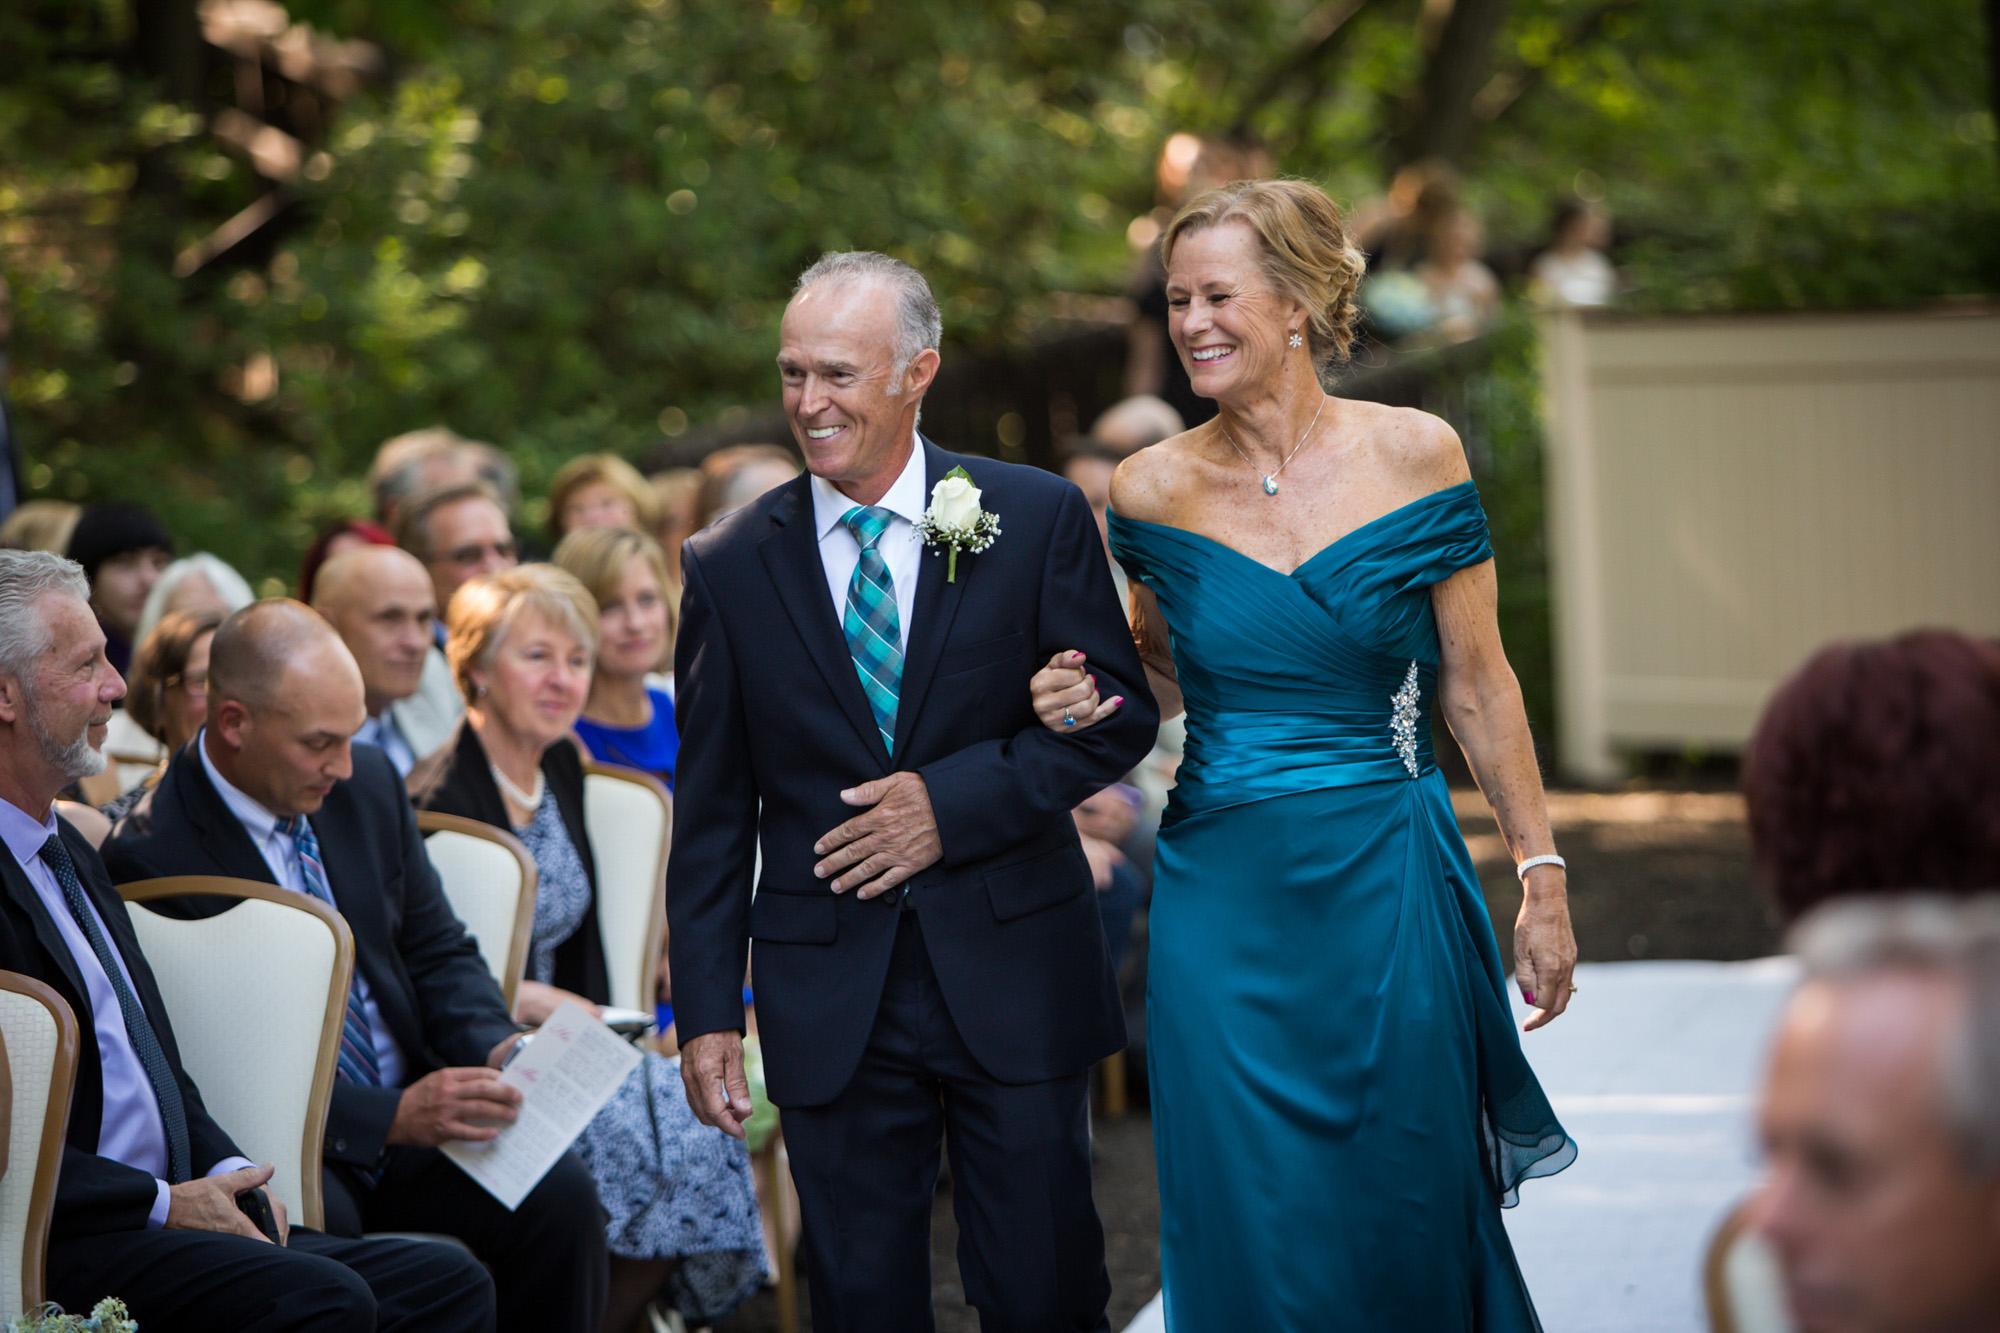 scranton_wedding_photographer_lettieri_pa-0469.jpg